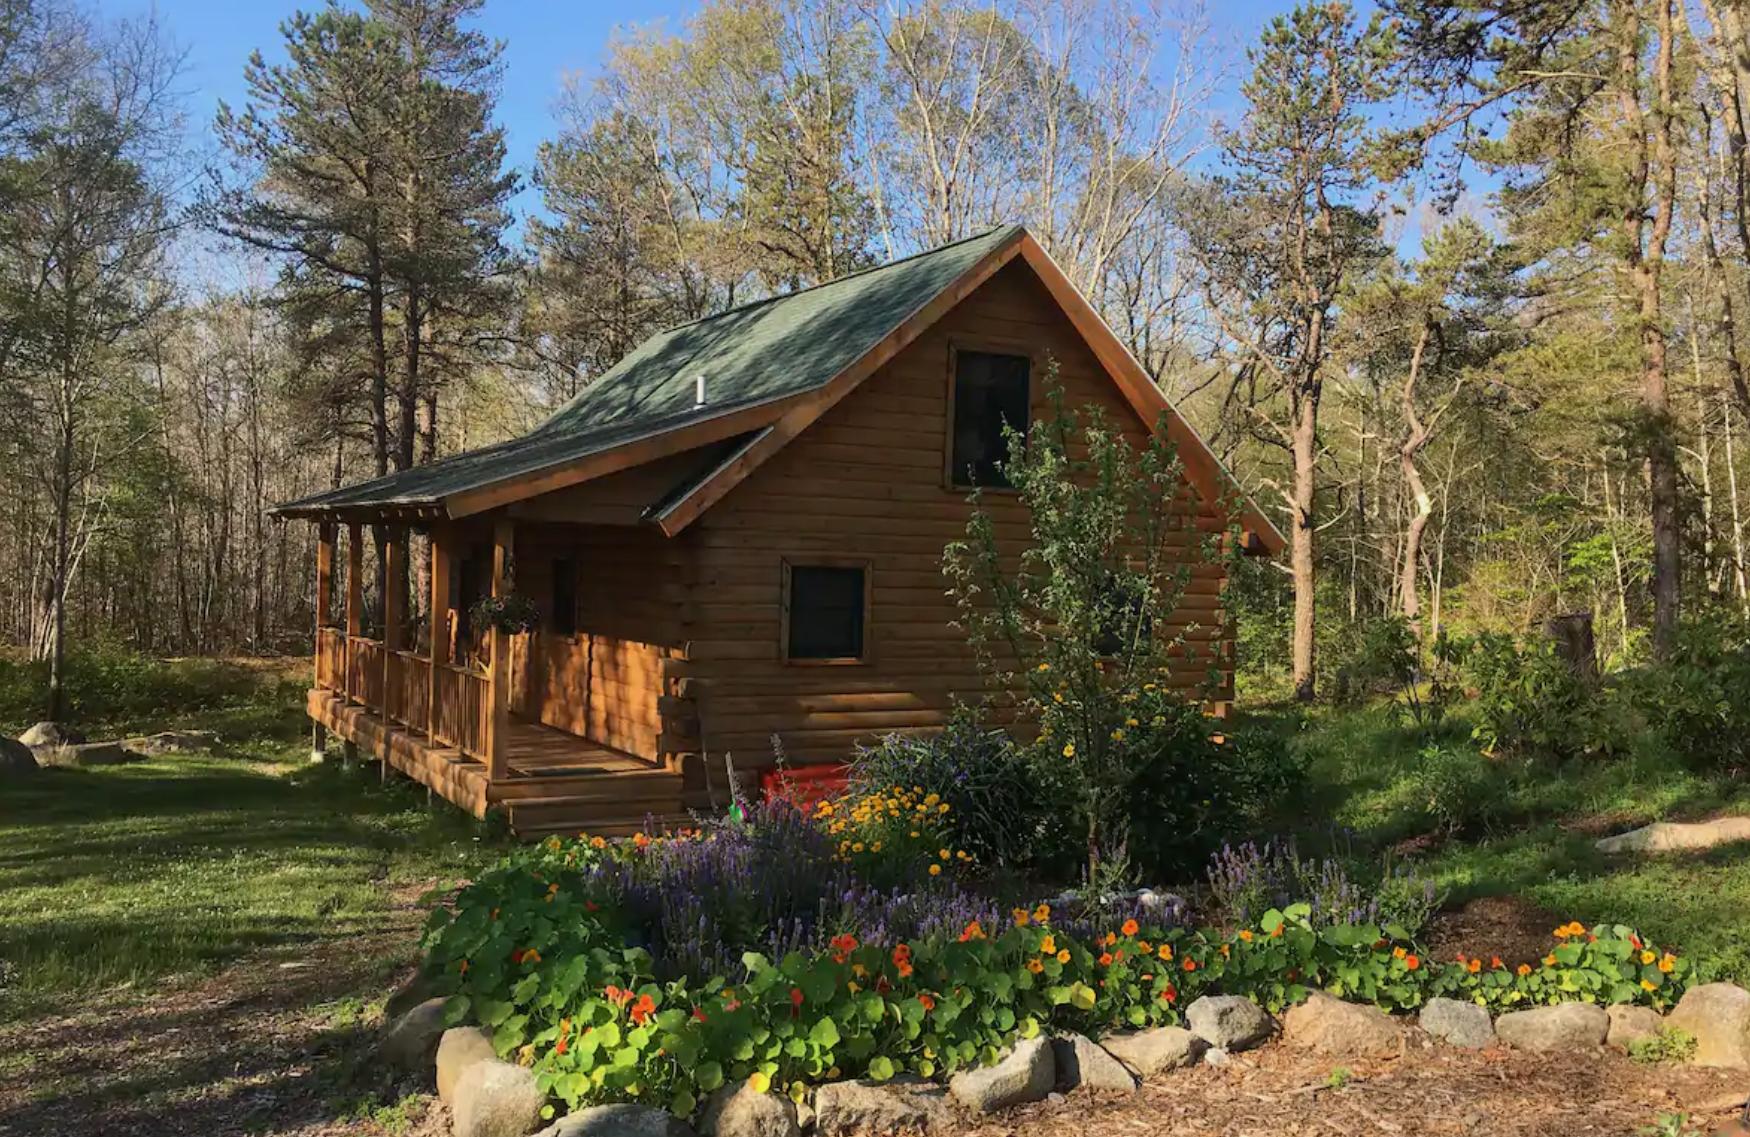 The Dogtown Cabin at Apple Cart Farm